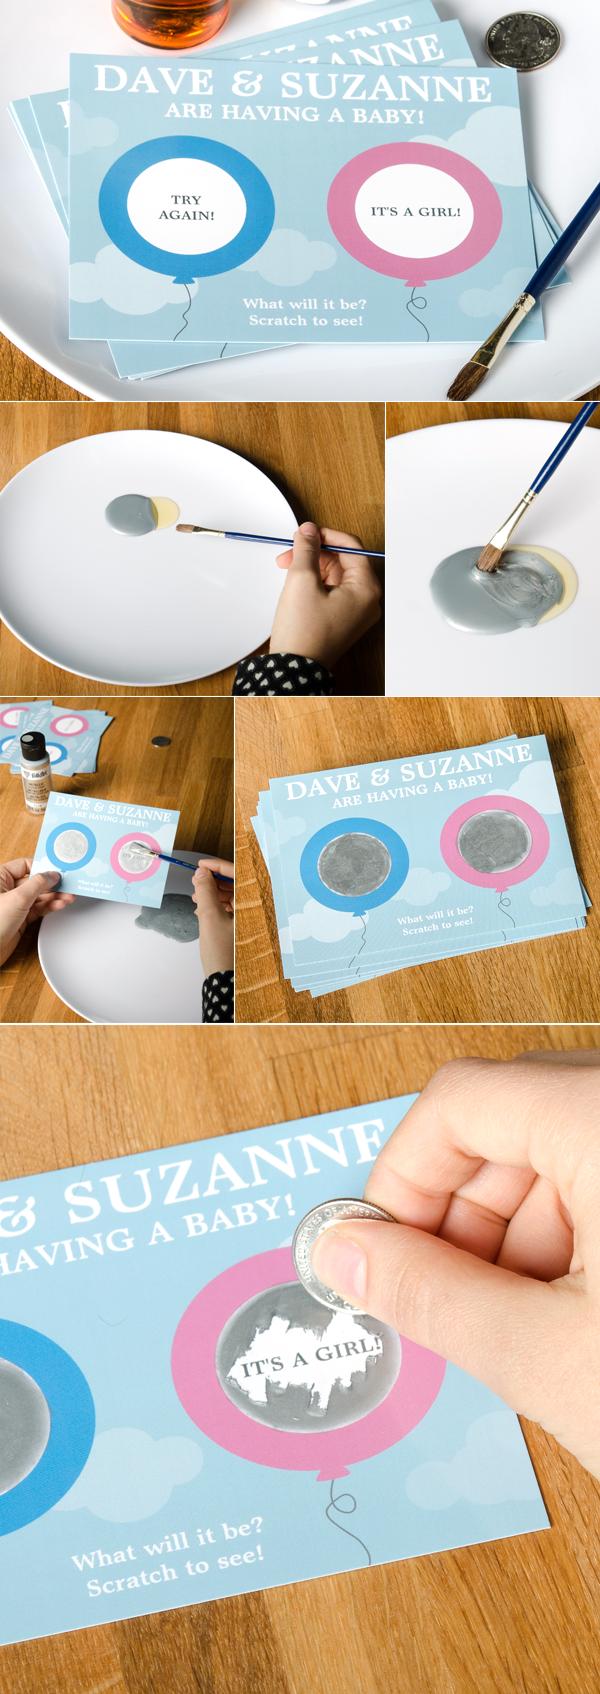 Diy Baby Shower Series Scratcher Postcards Zazzle Ideas Baby Reveal Party Gender Reveal Diy Baby Shower Gender Reveal